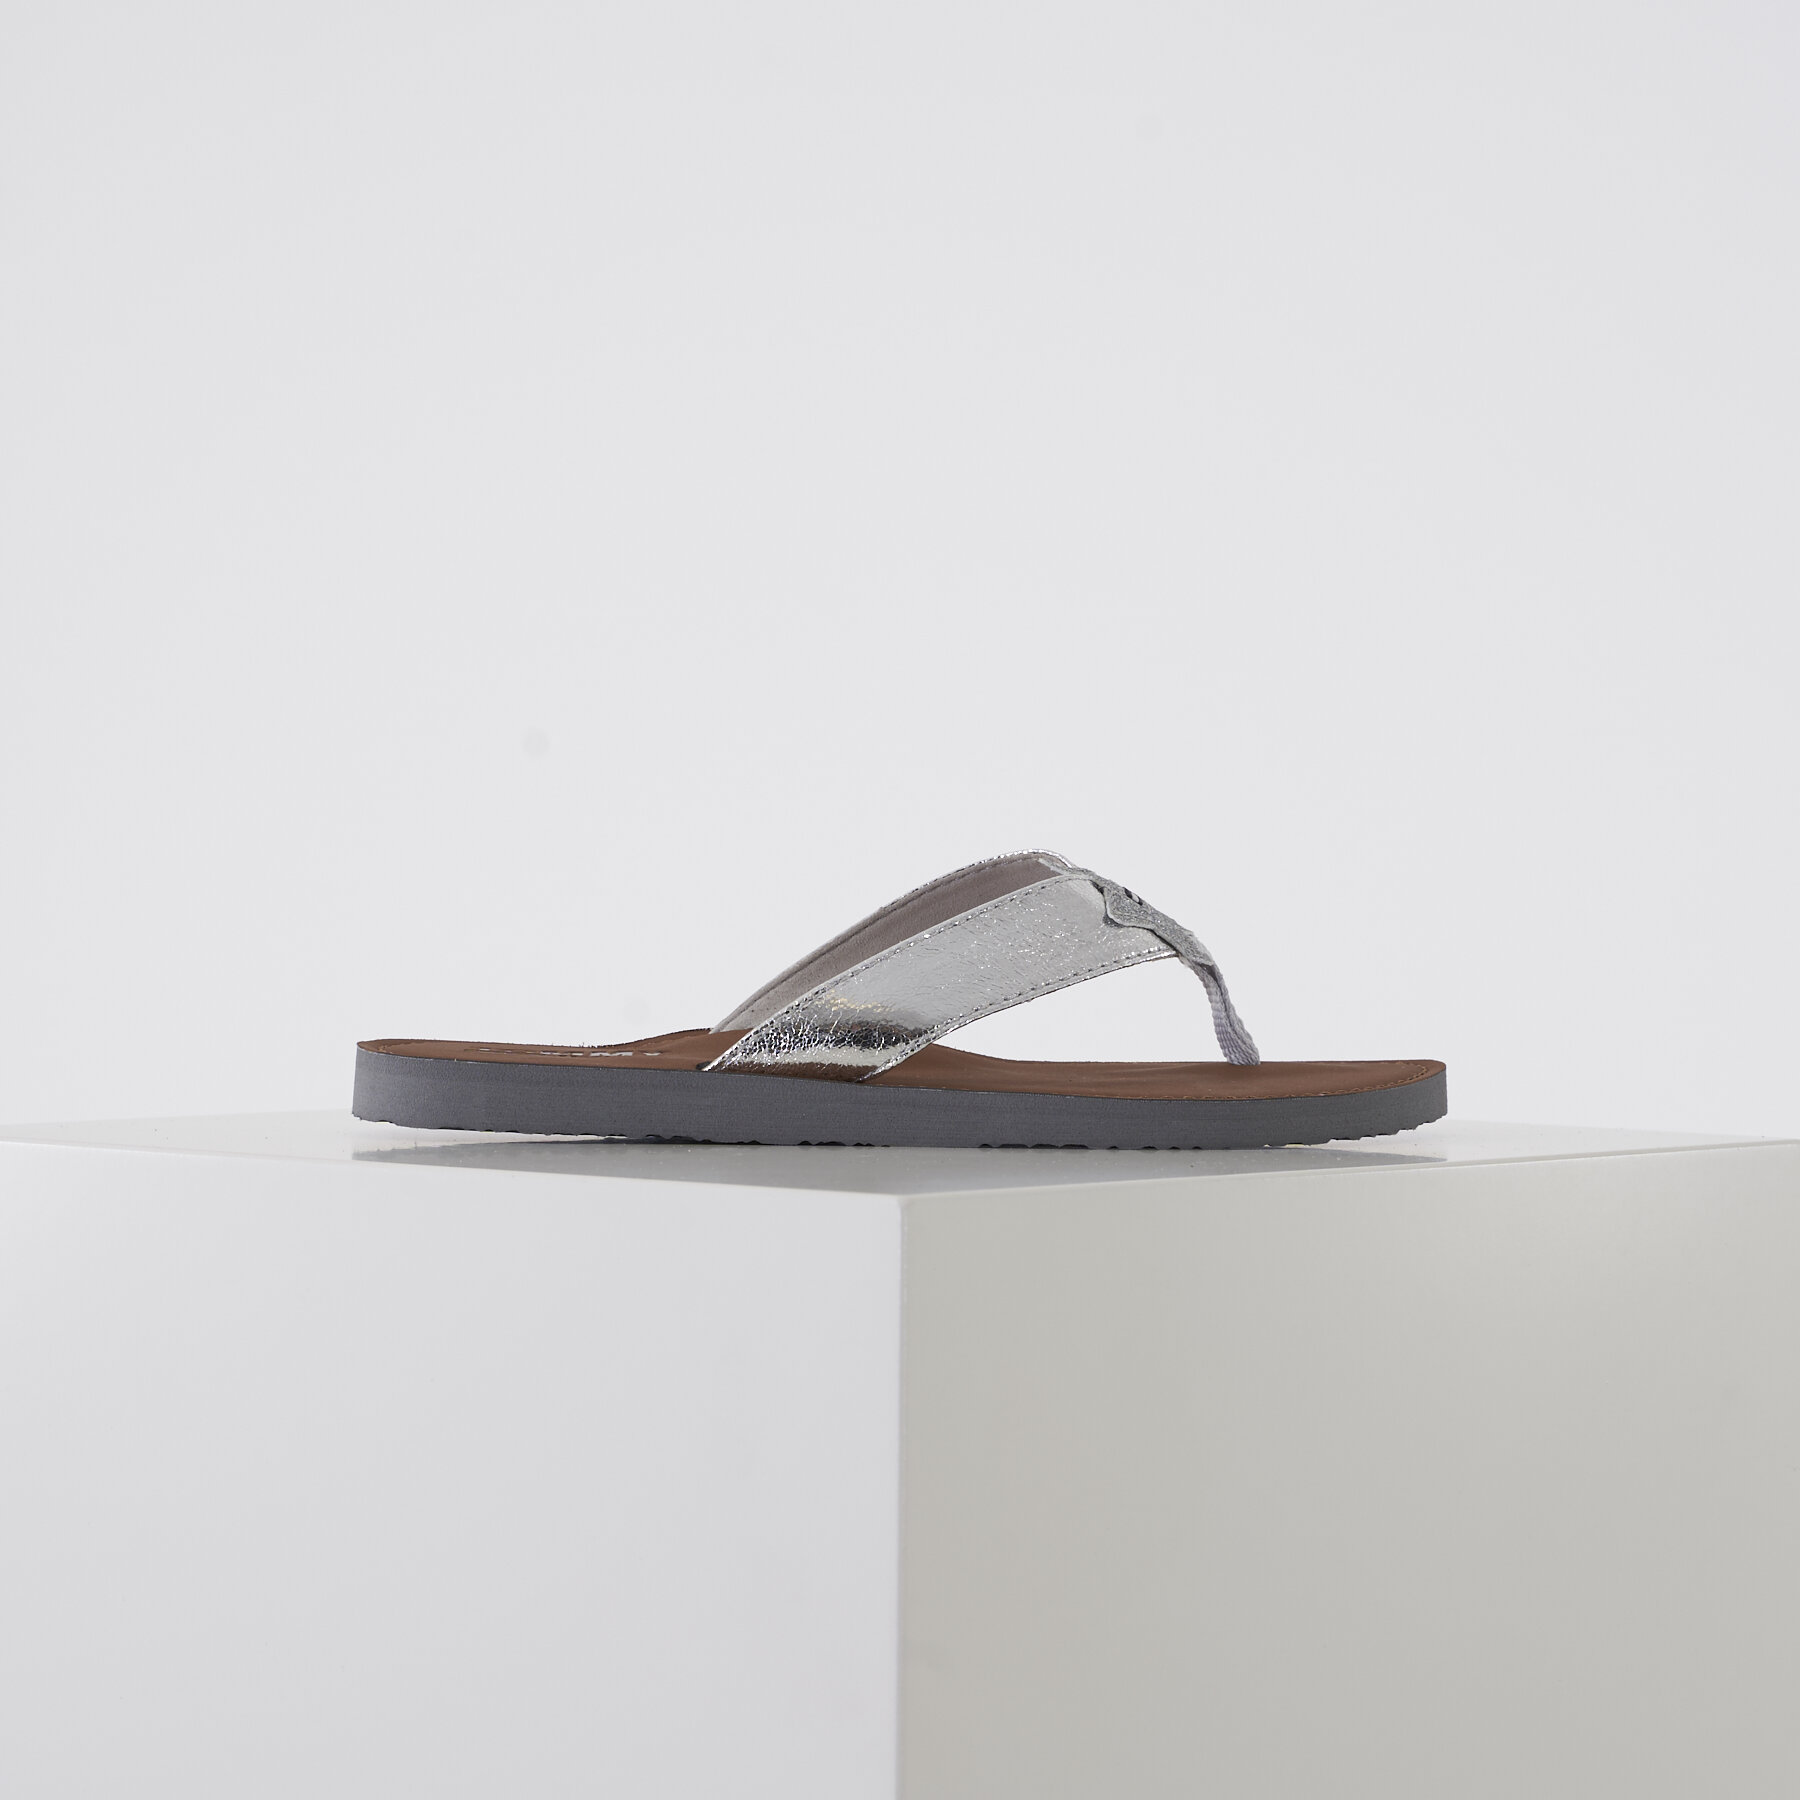 Køb Tommy Hilfiger Shoes – Sea 19 – Damesko – 000 SILKY NUDE – 36